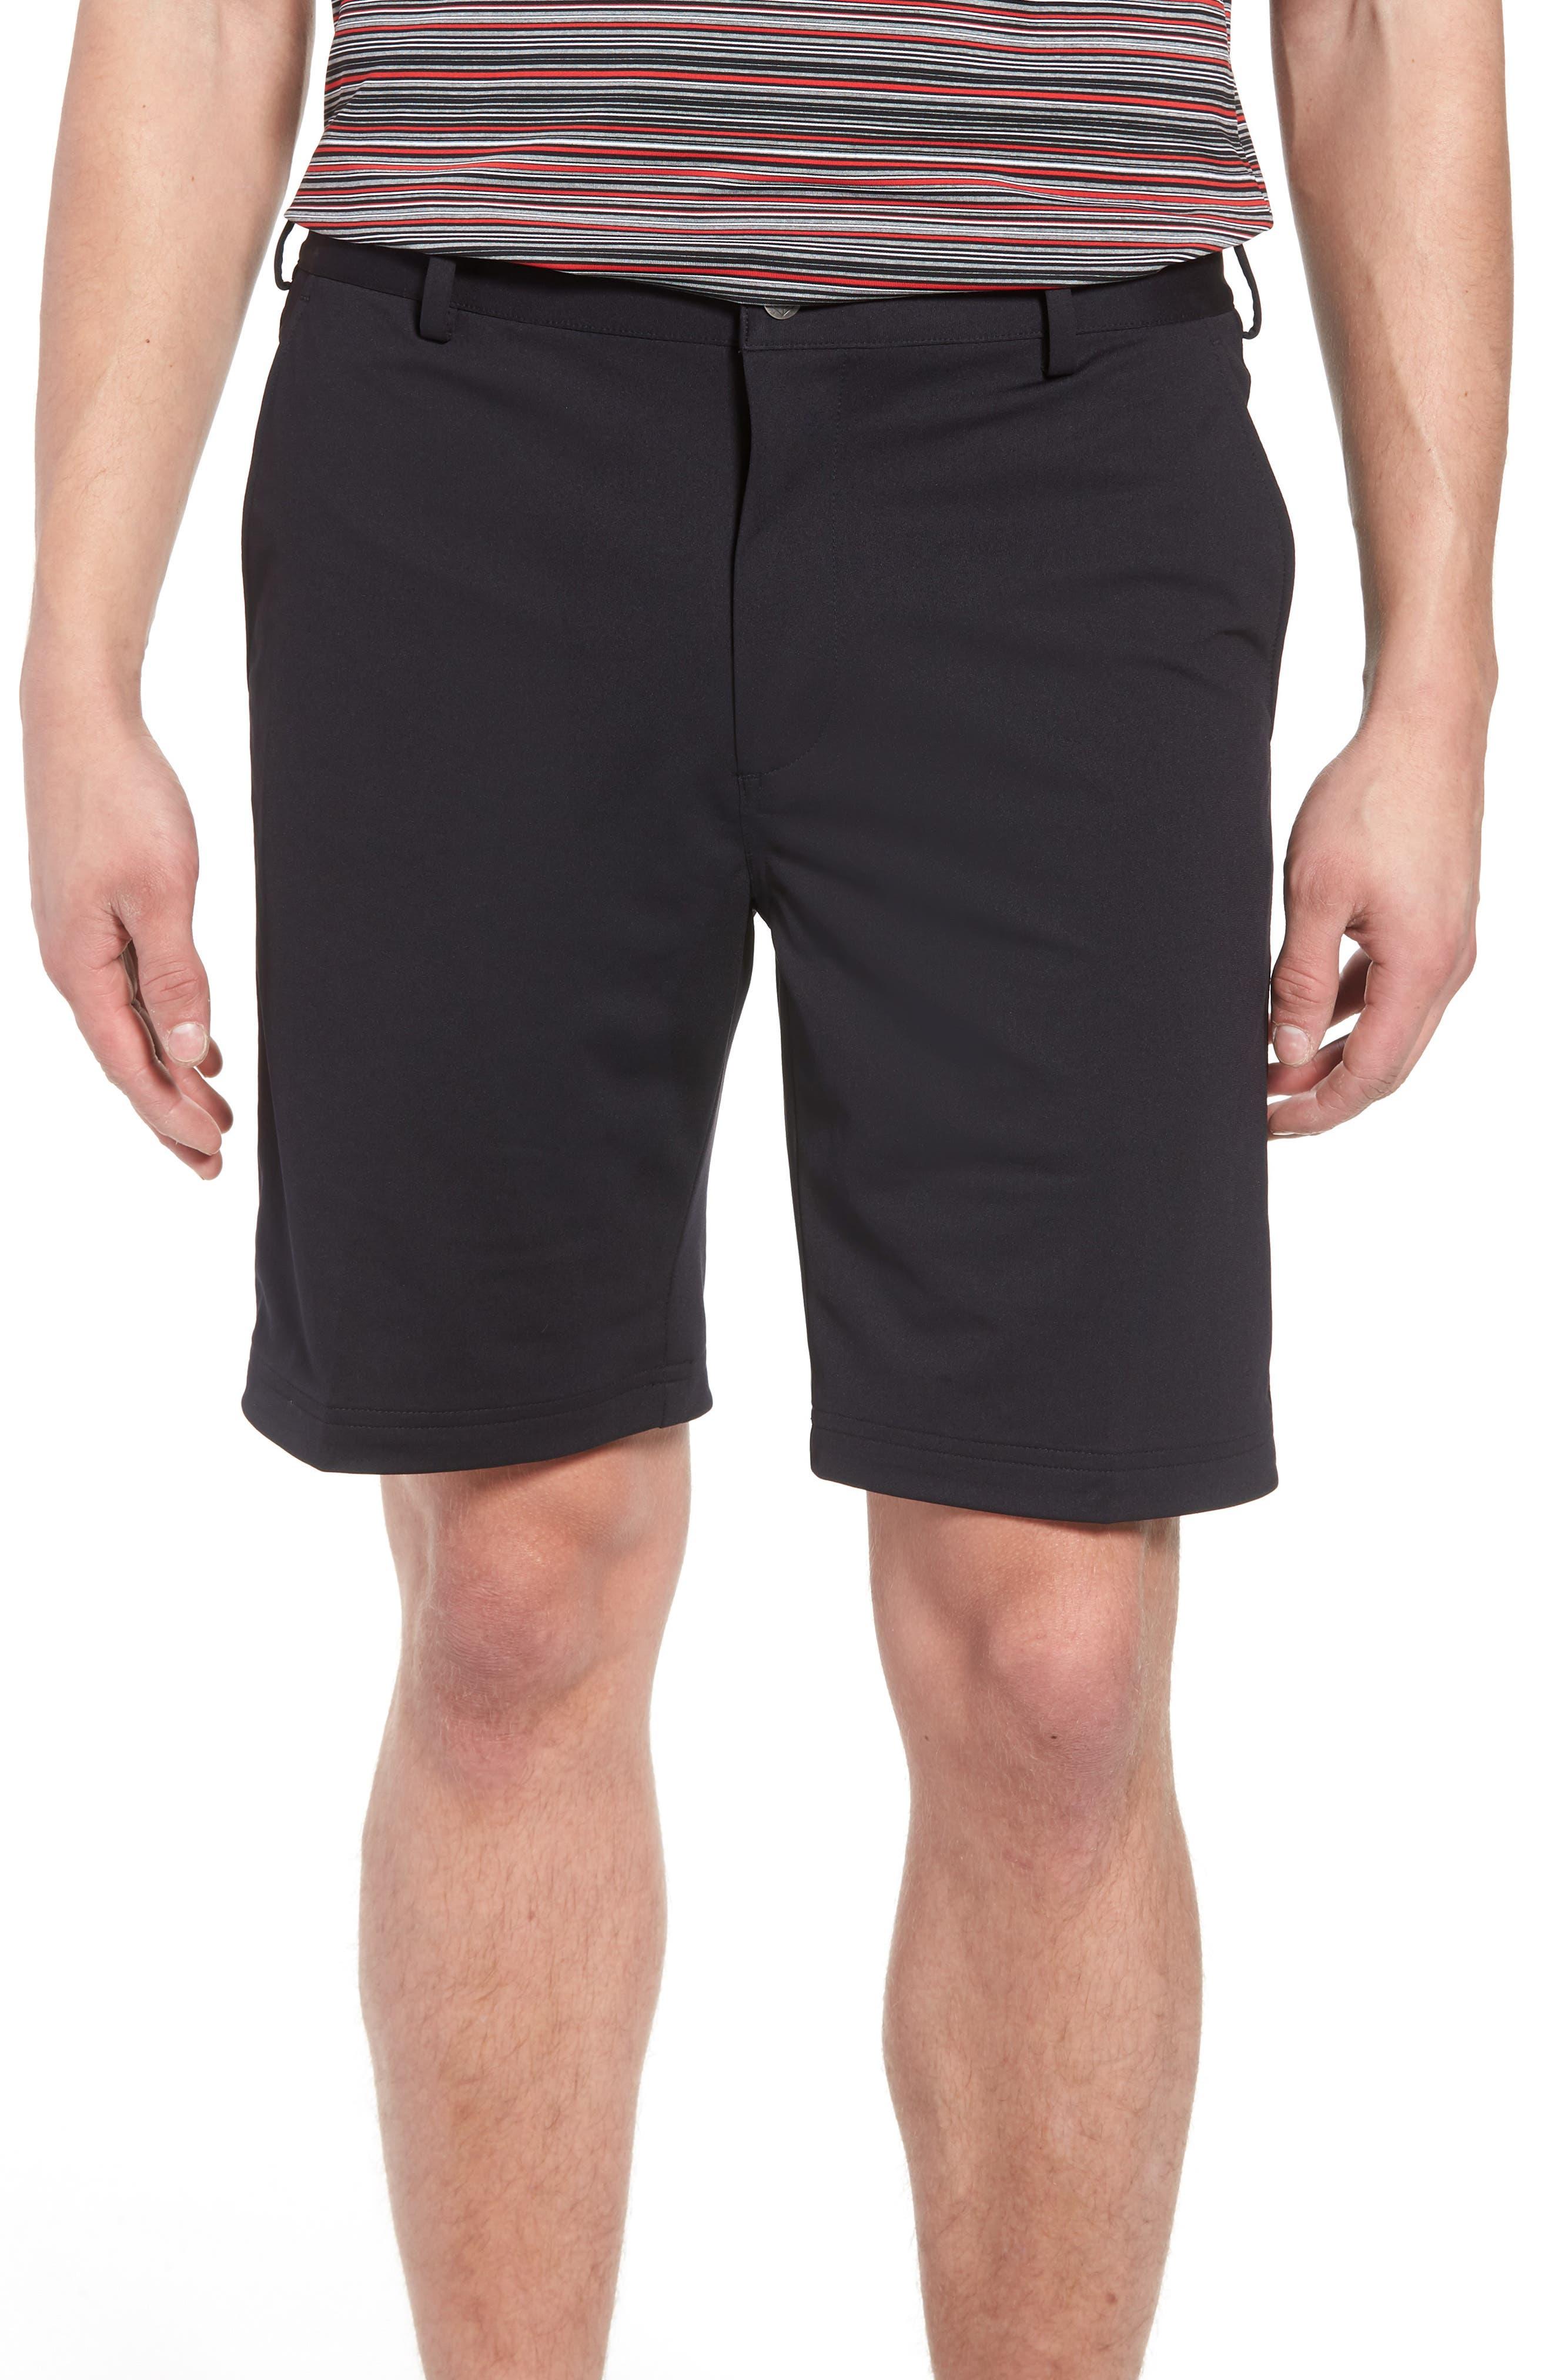 BOBBY JONES,                             Trim Fit Tech Chino Shorts,                             Main thumbnail 1, color,                             001